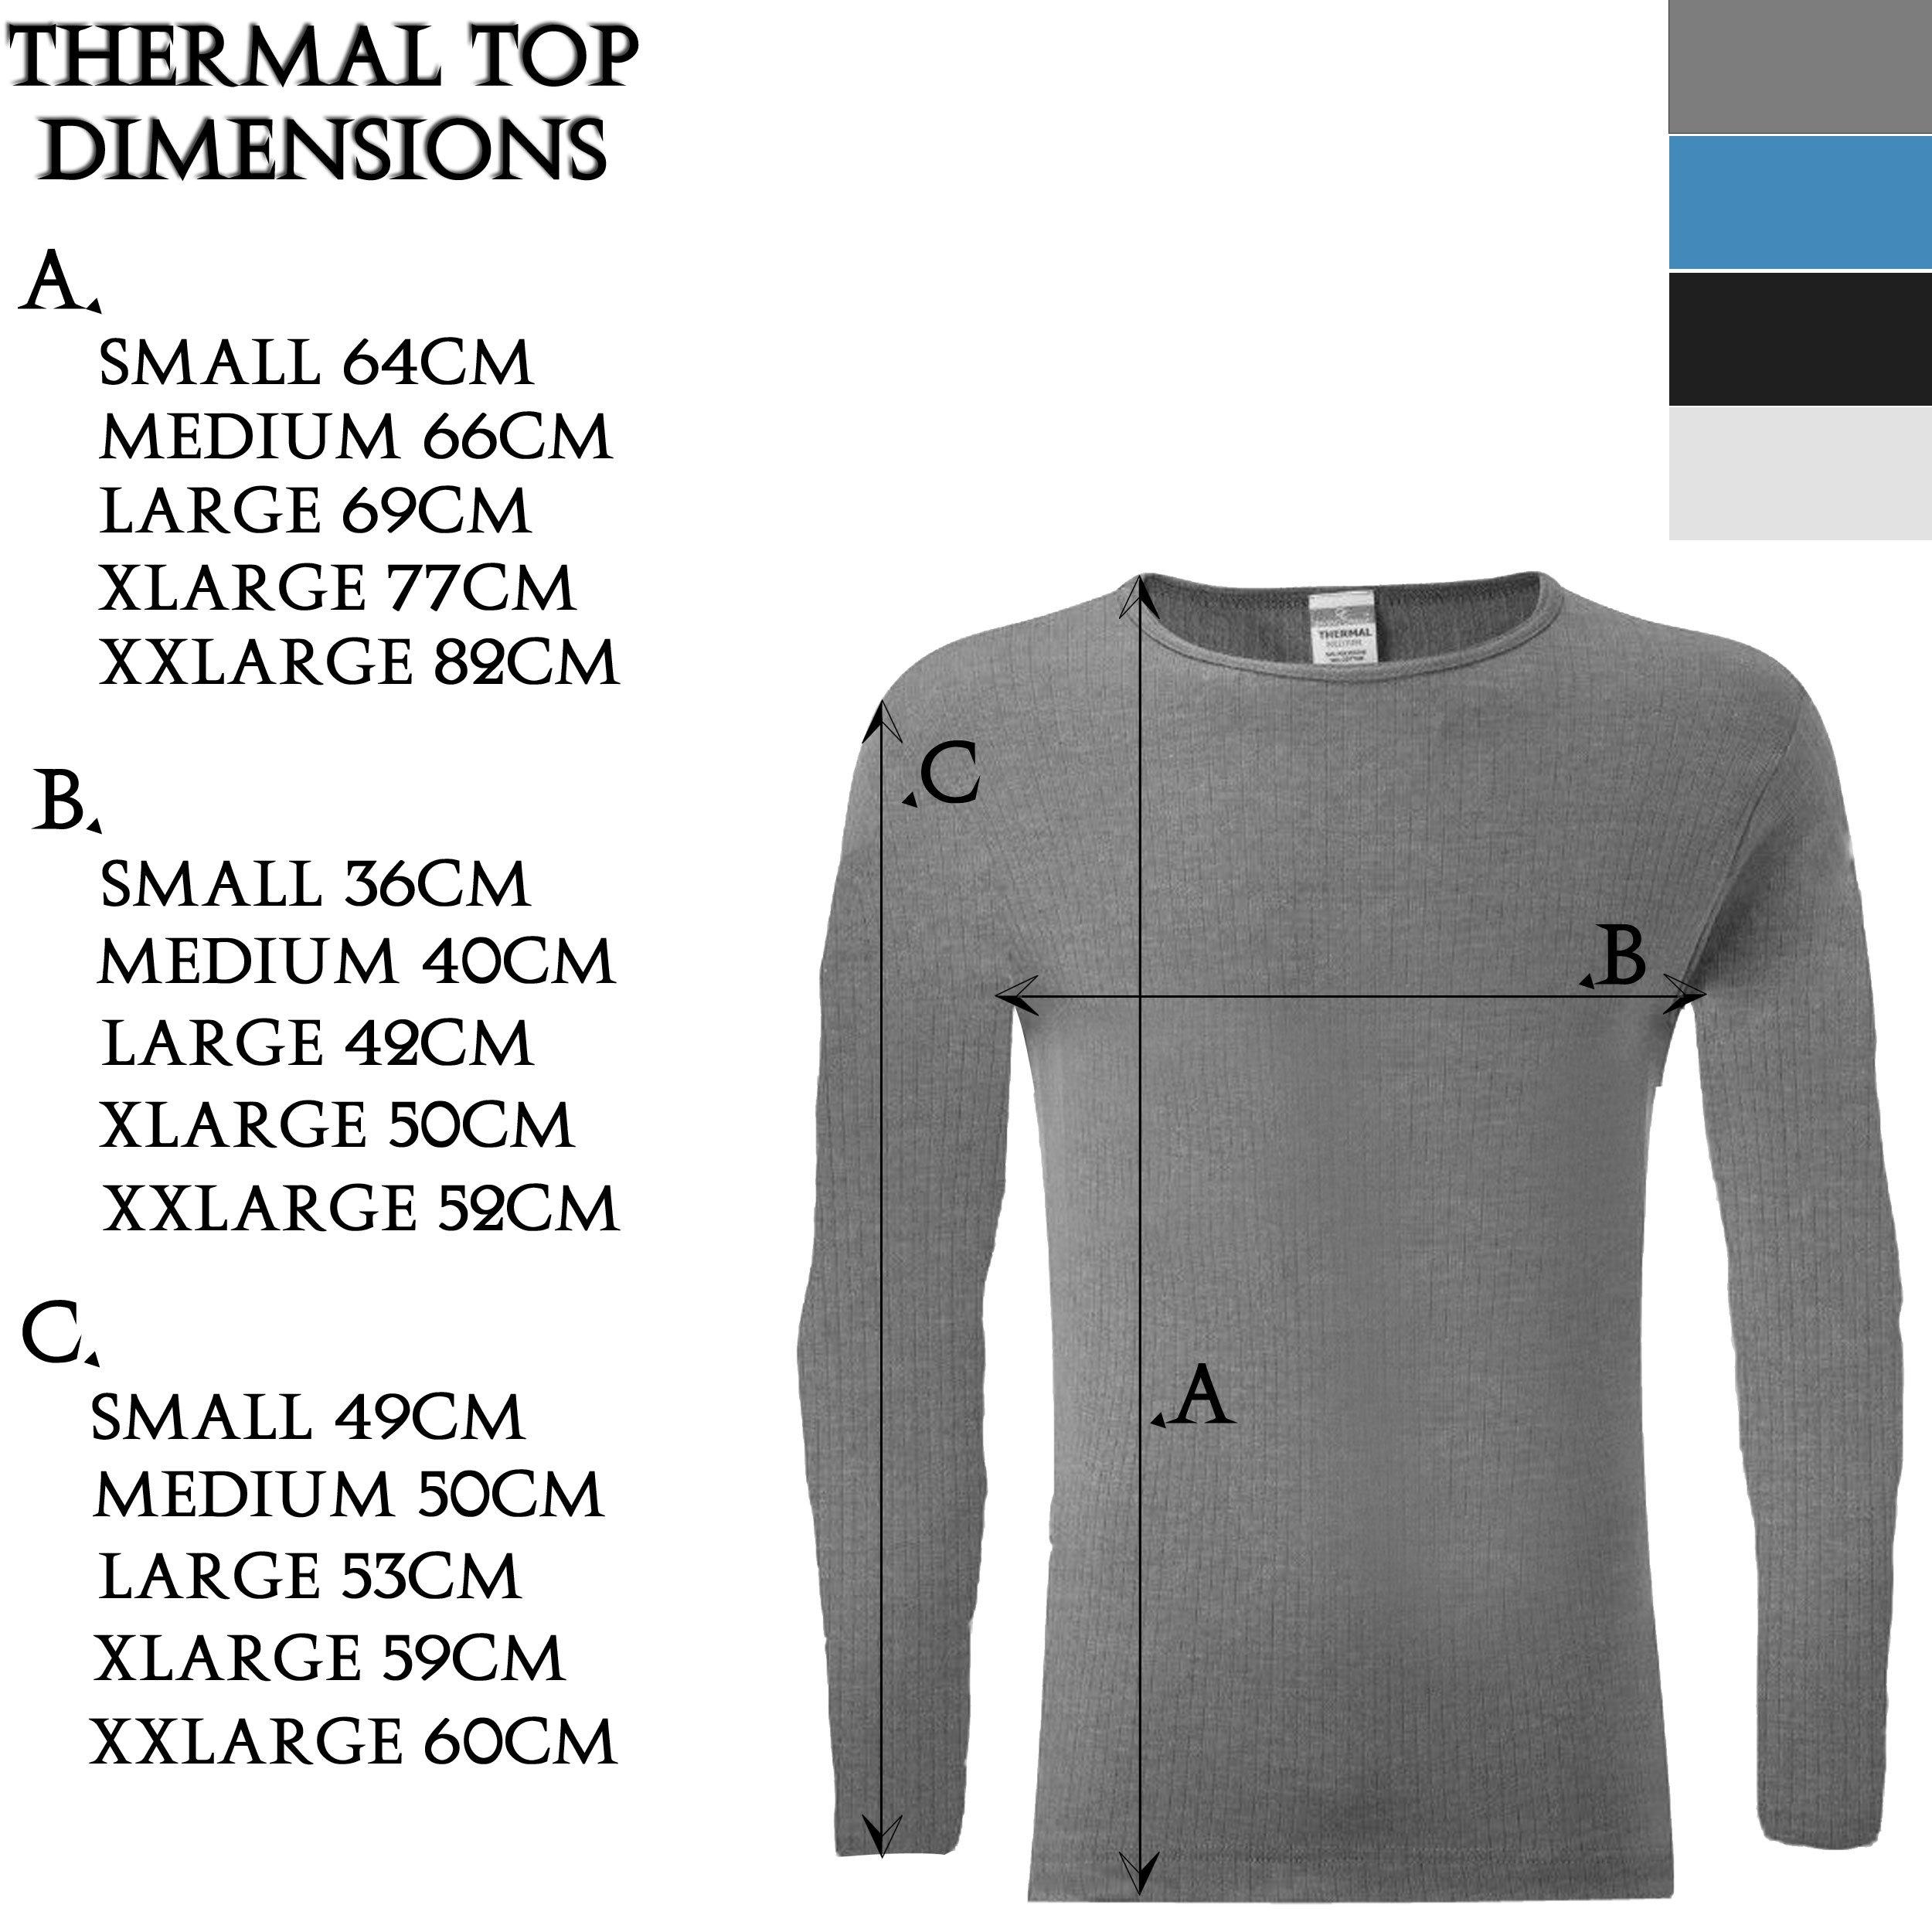 Tazzio T-Shirt Herren Rundhals Motiv-Print Druck Kurzarm Shirt TZ-17106 NEU